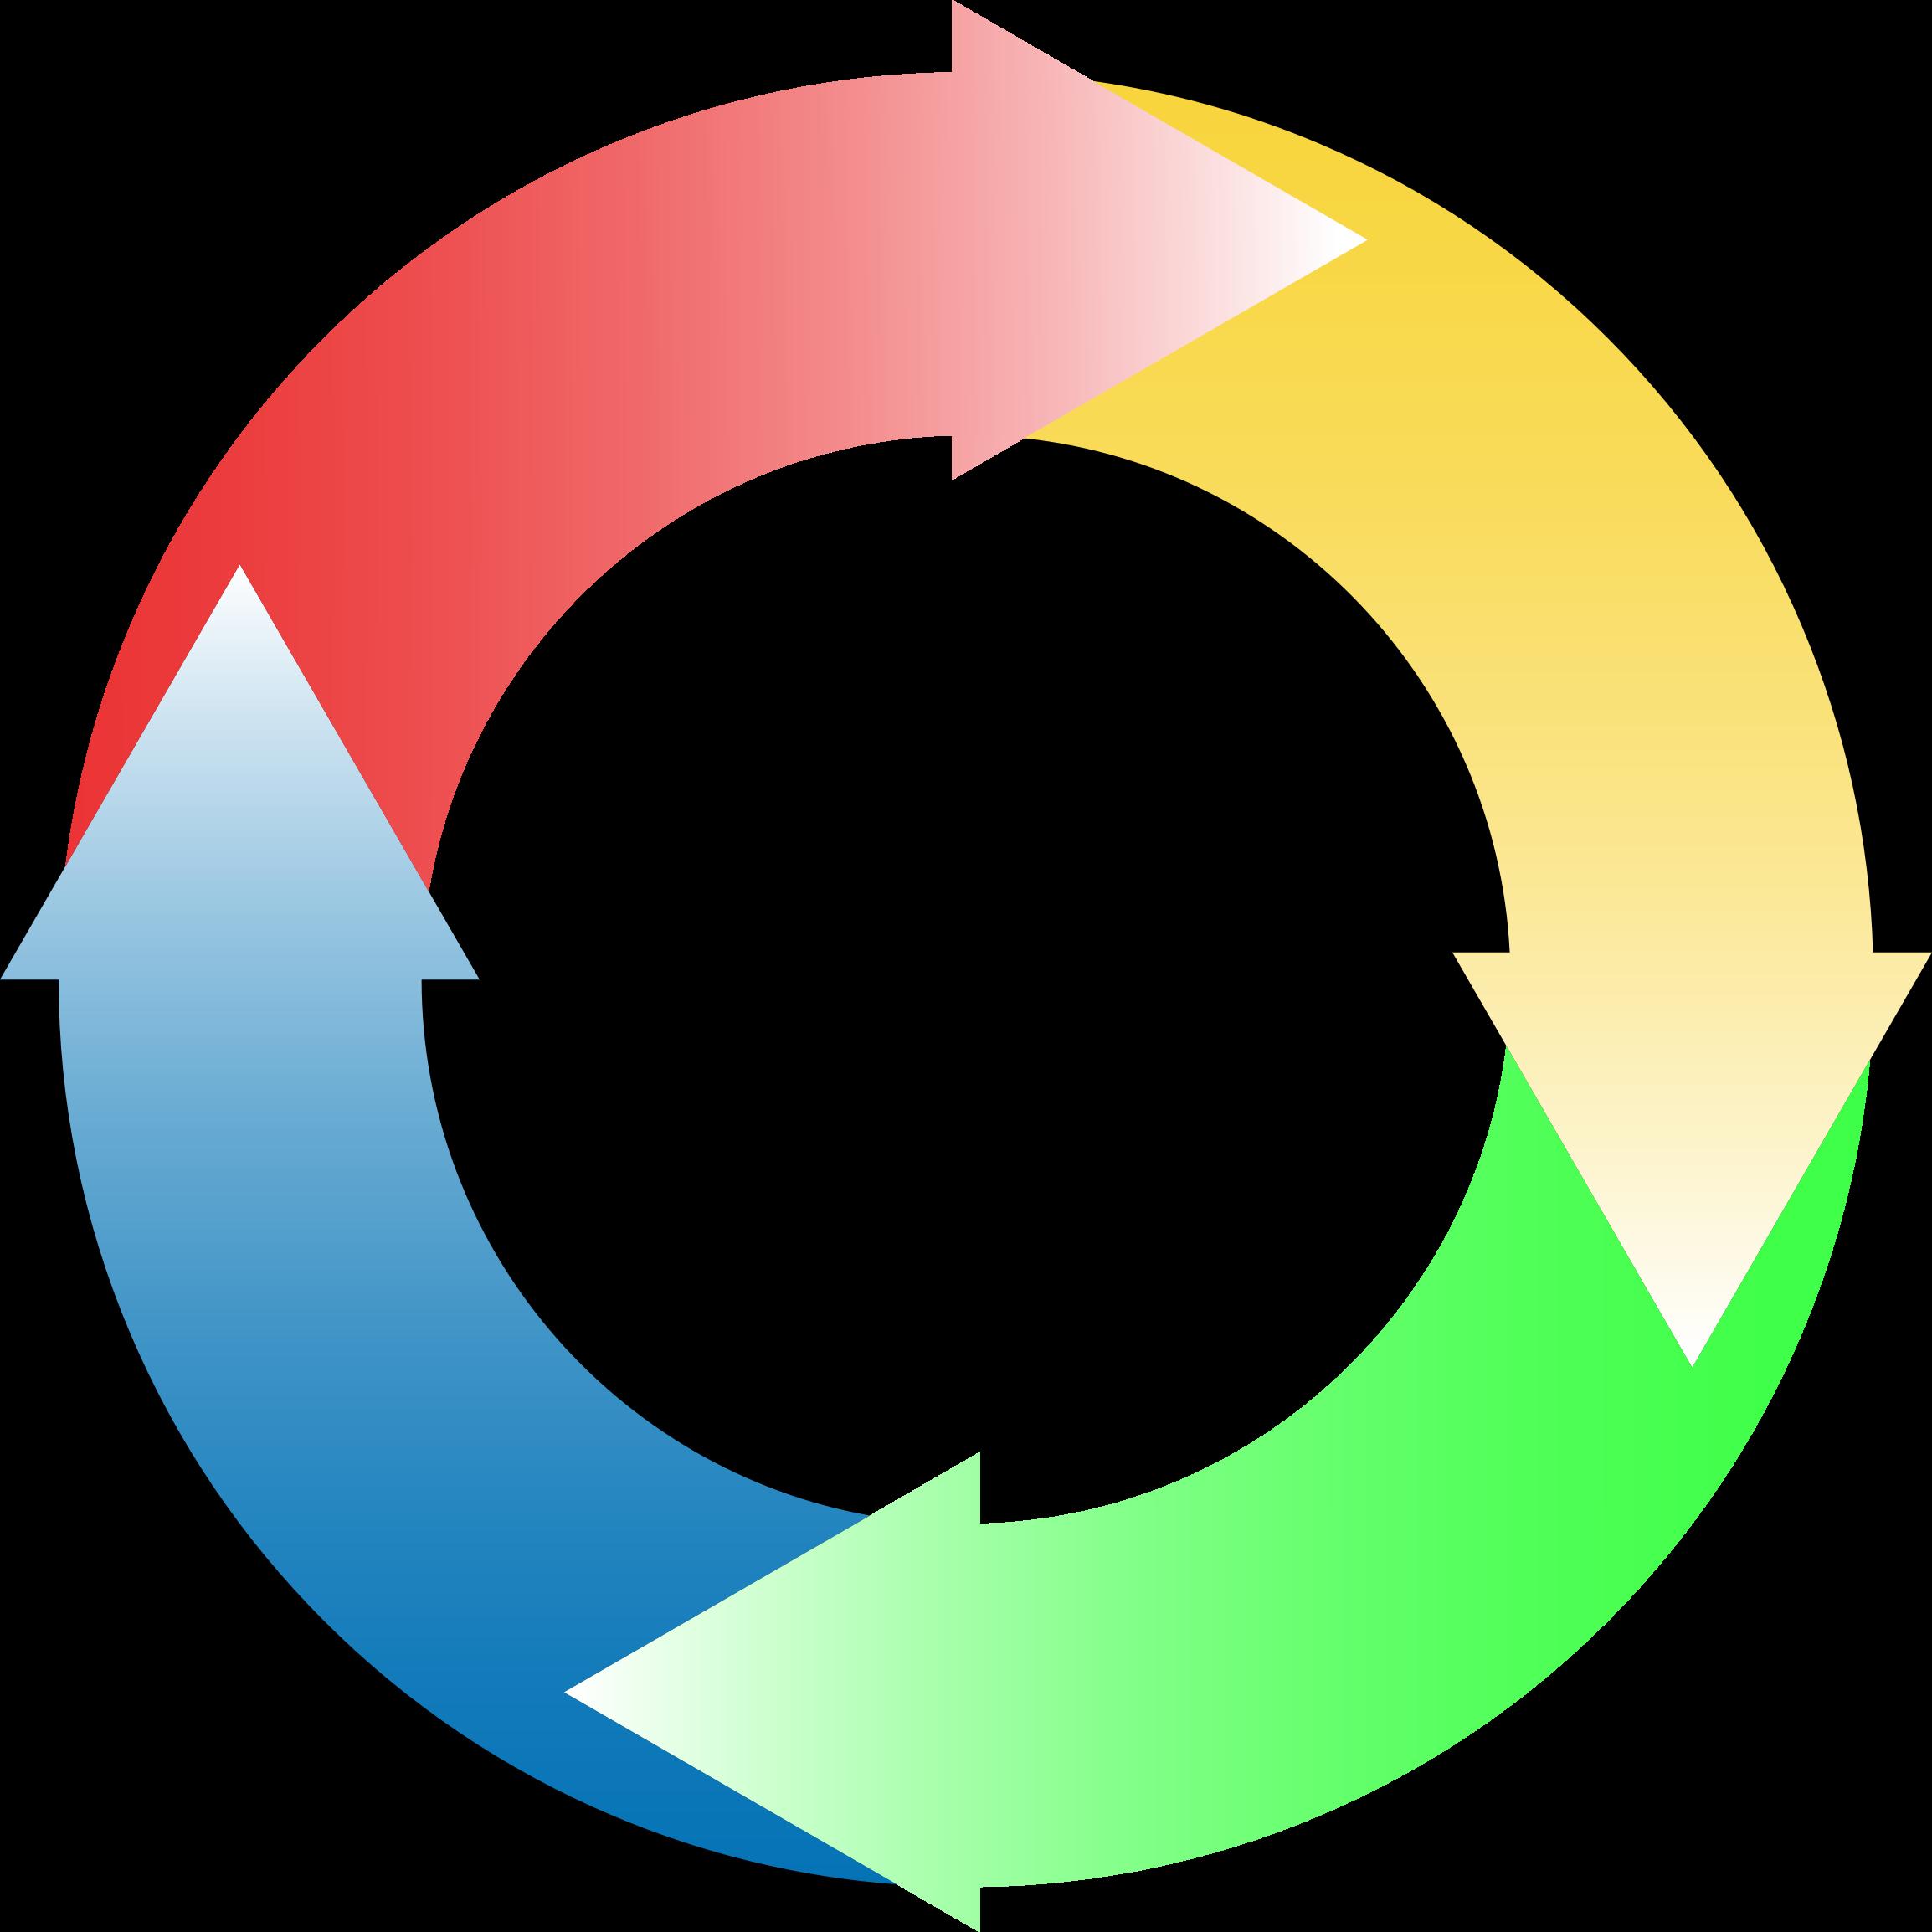 vector stock Circular icons png free. Circle of arrows clipart